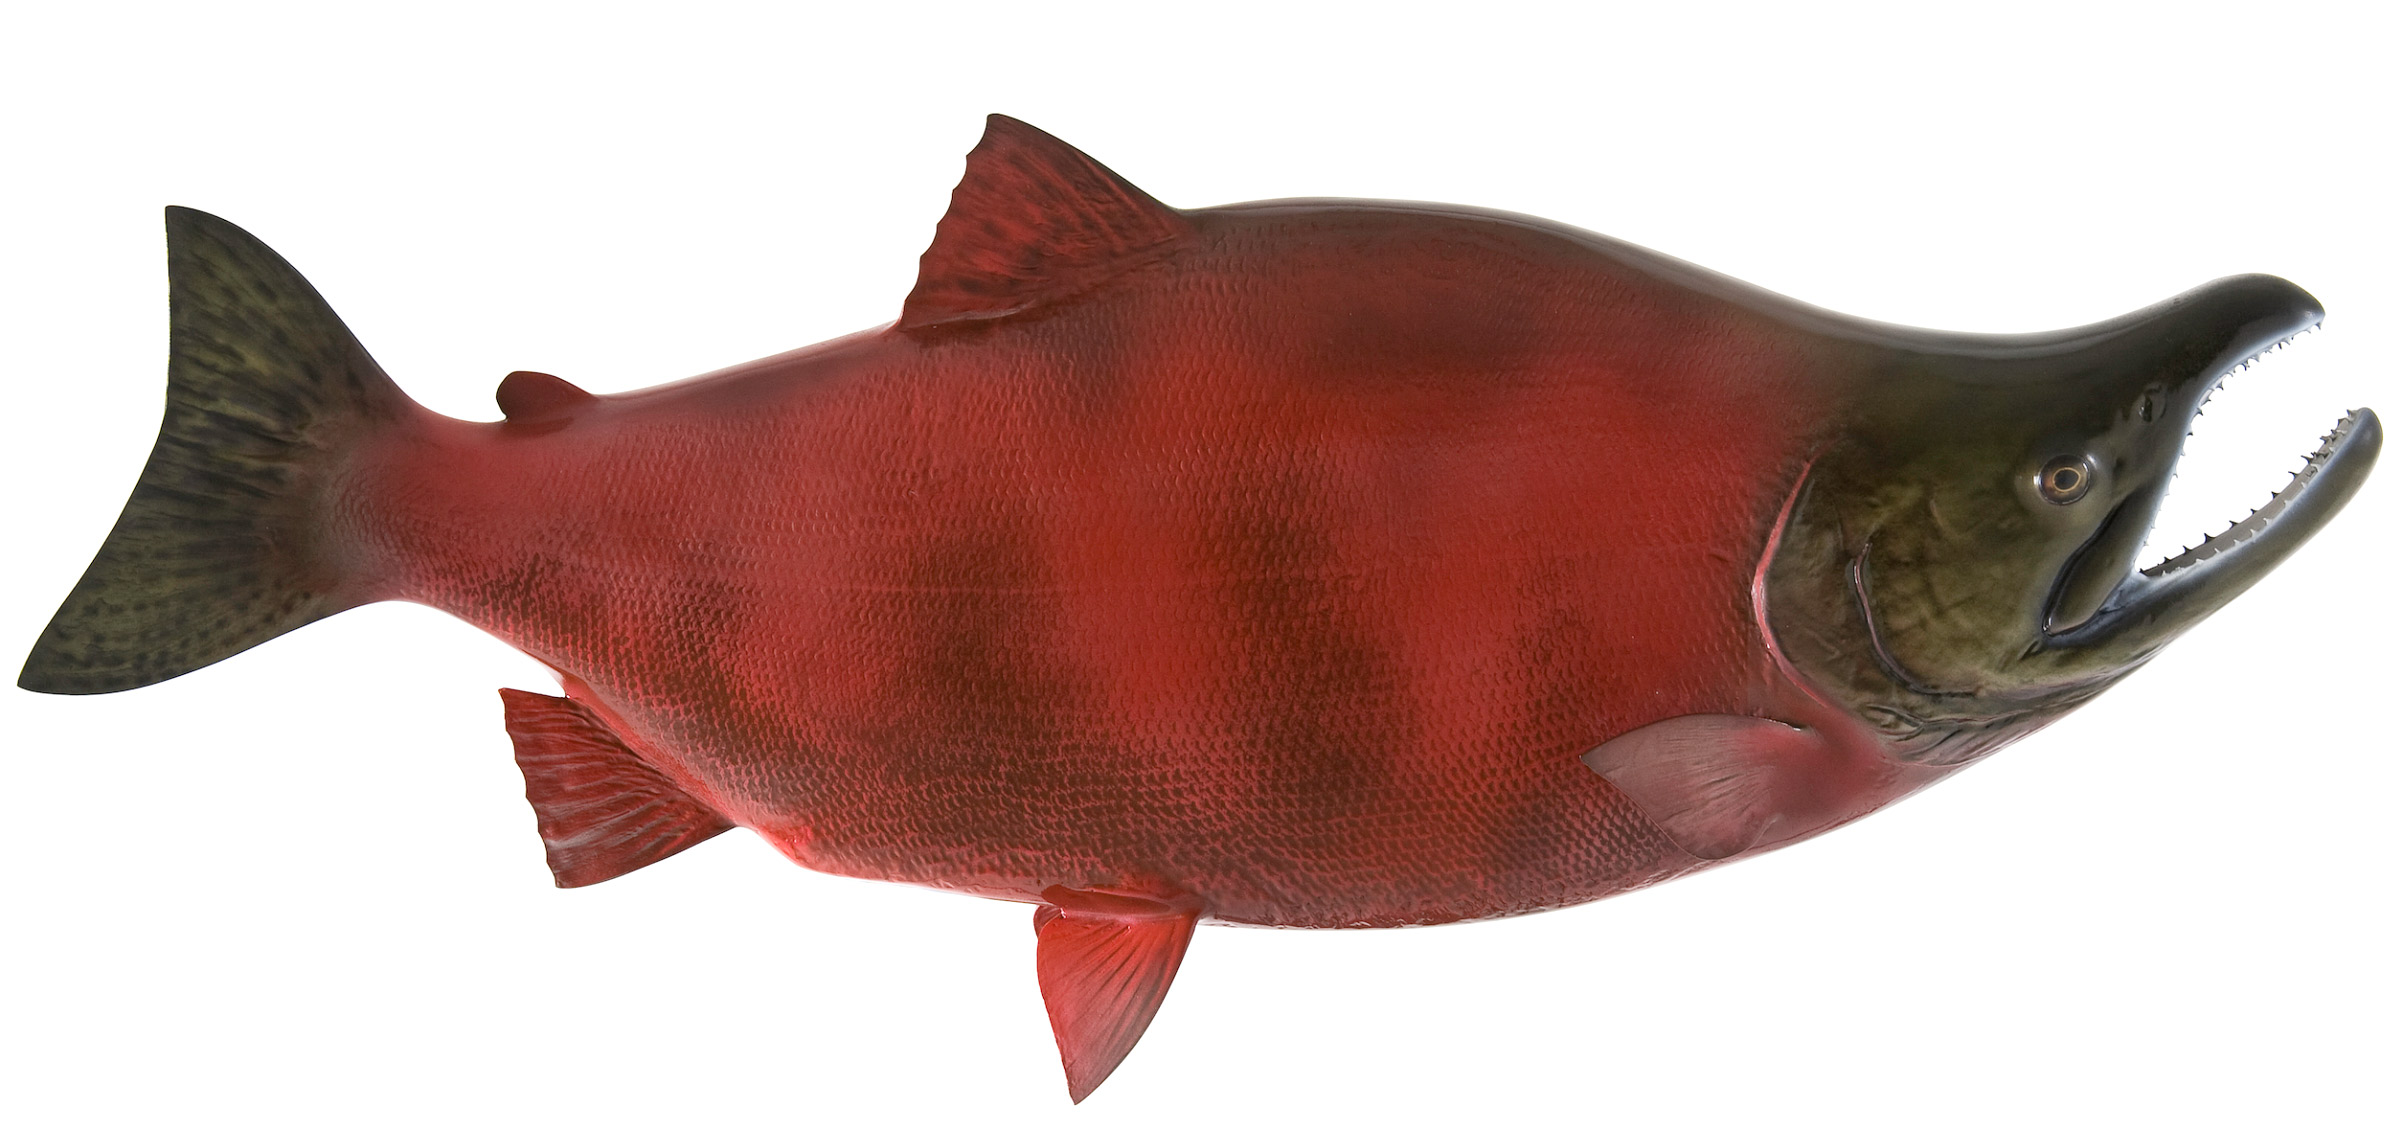 Red salmon fish - photo#34